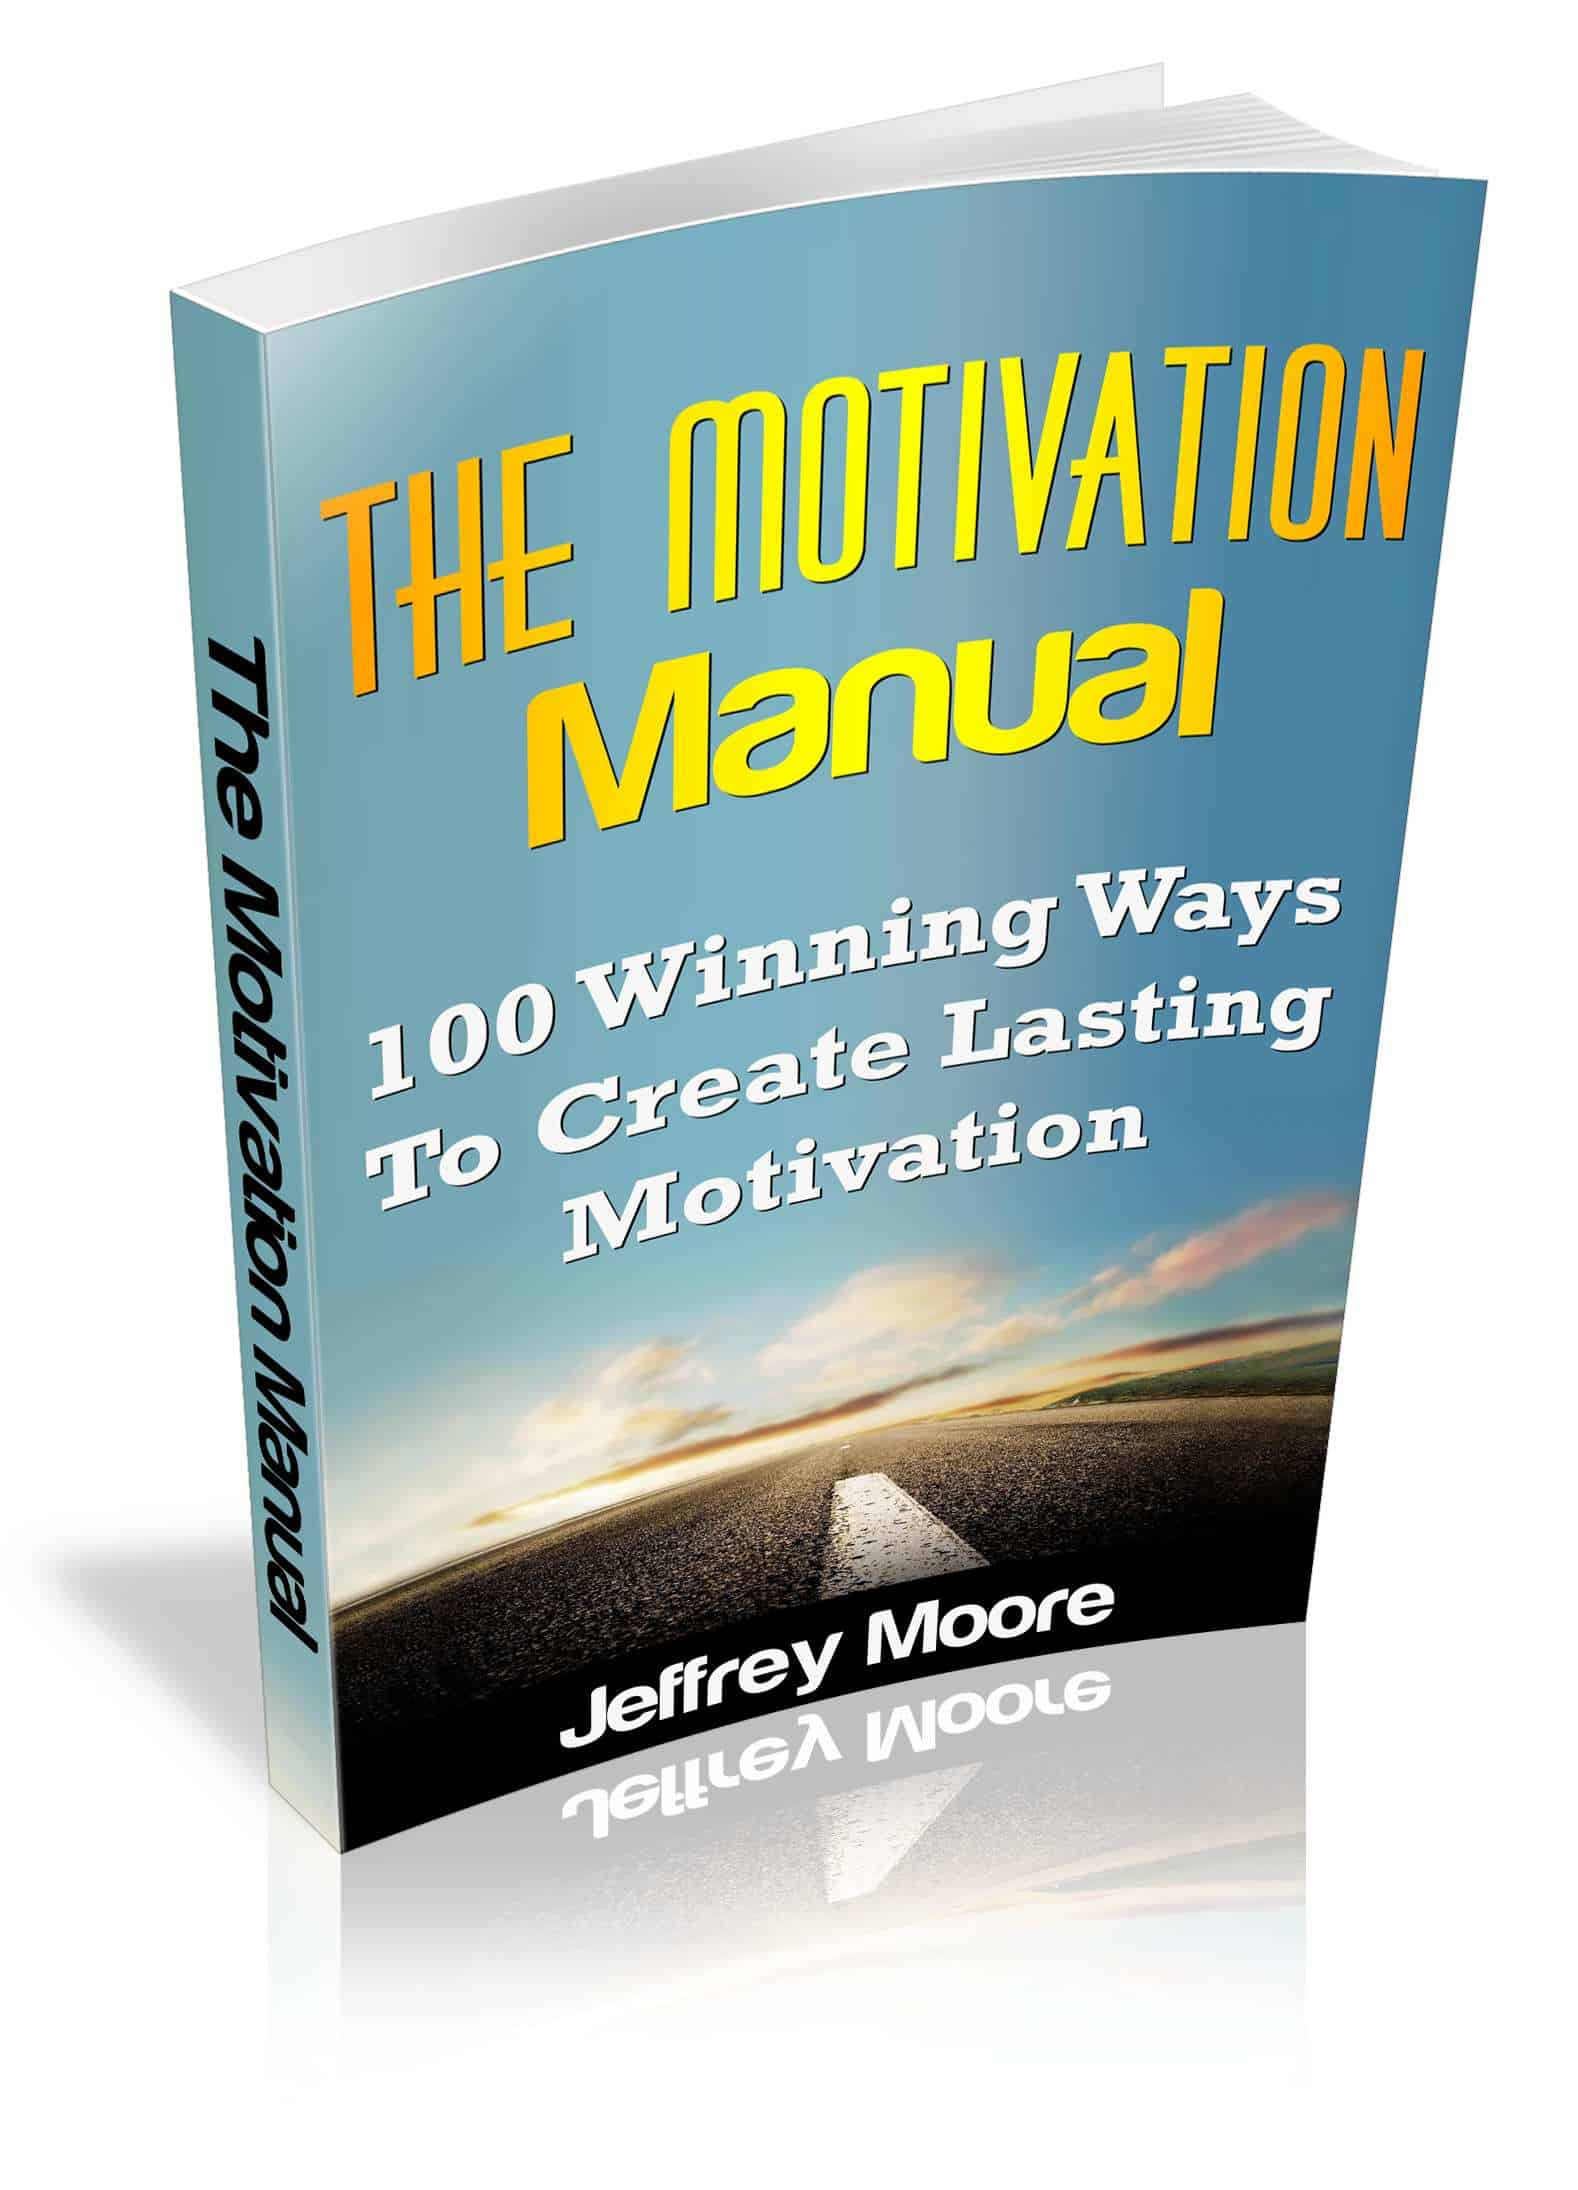 The Motivation Manual: 100 Winning Ways To Create Lasting Motivation